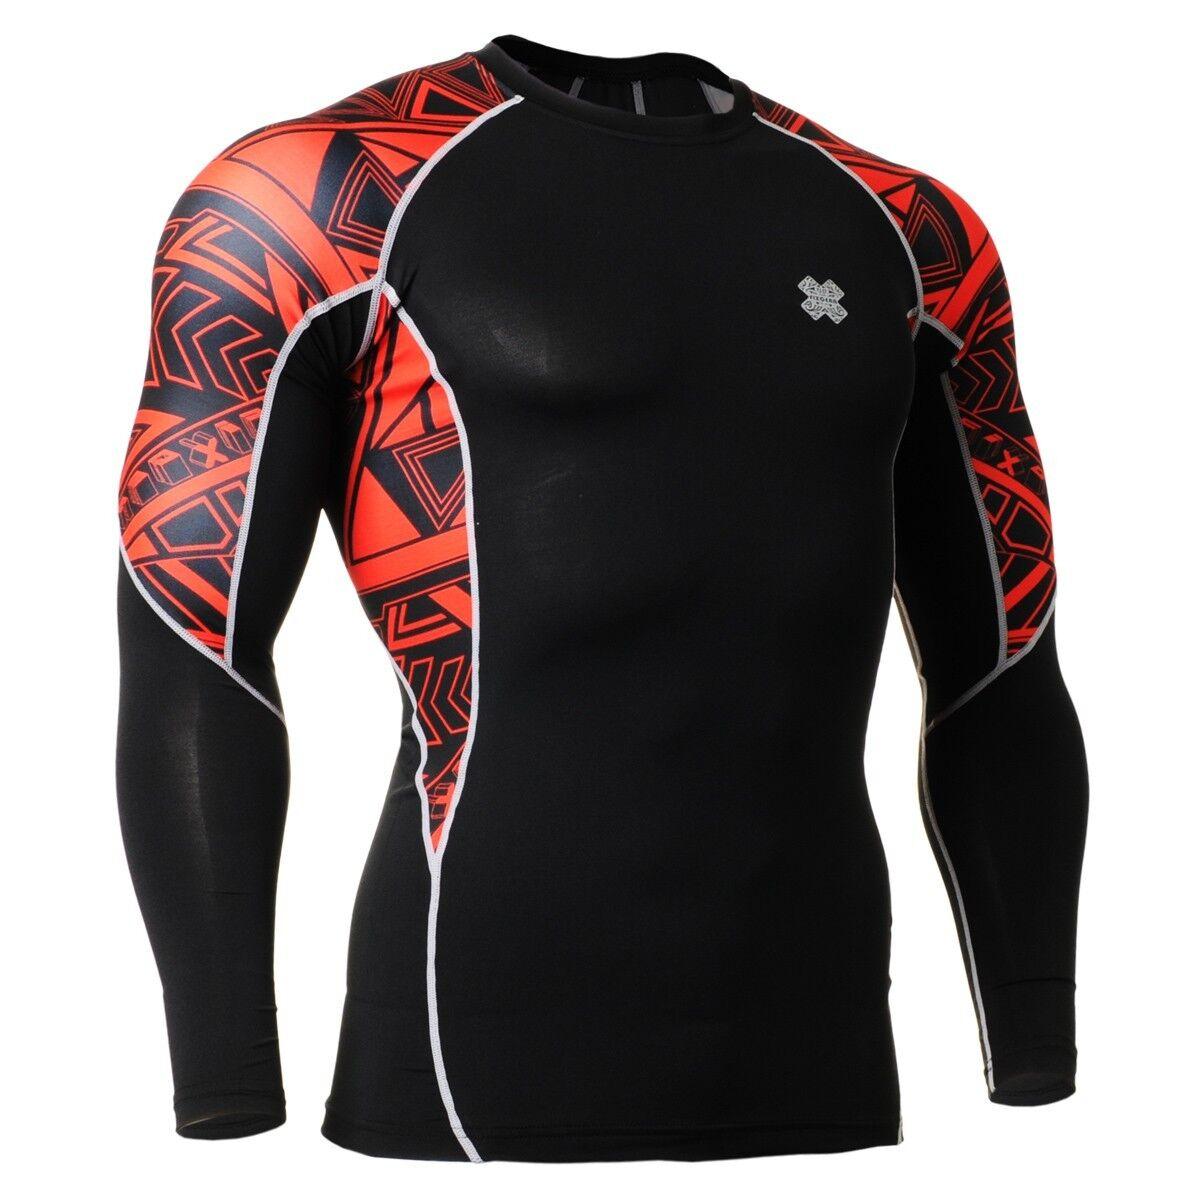 FIXGEAR C2L-B2 Compression Base Layer Shirt for Workout Gym MMA Sportswear